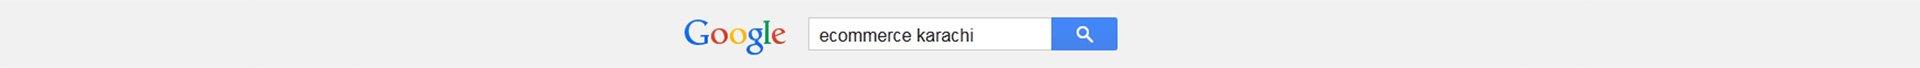 ecommerce karachi